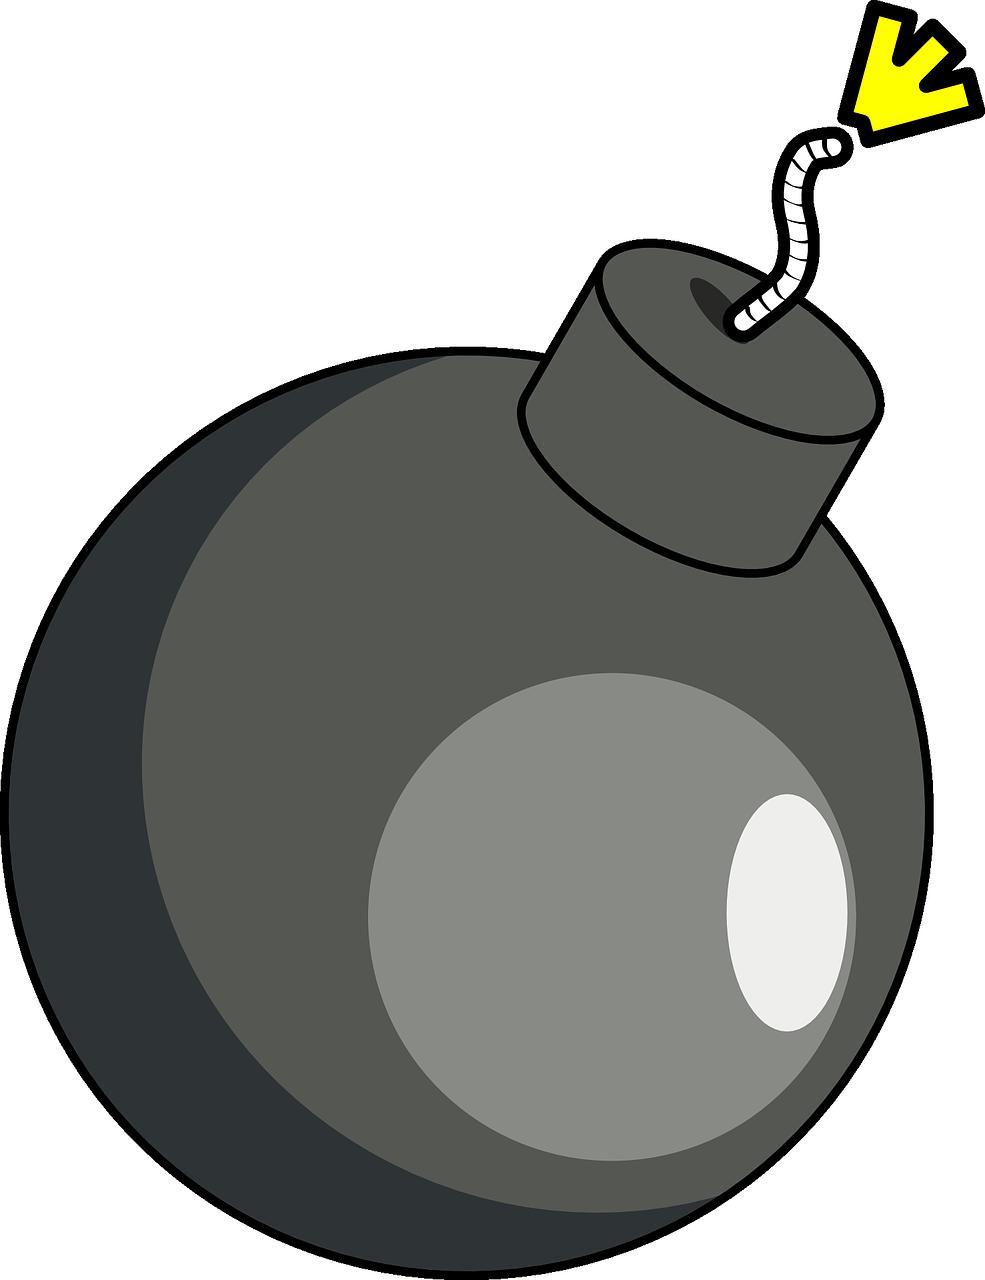 Bomb clip art images free clipart 2